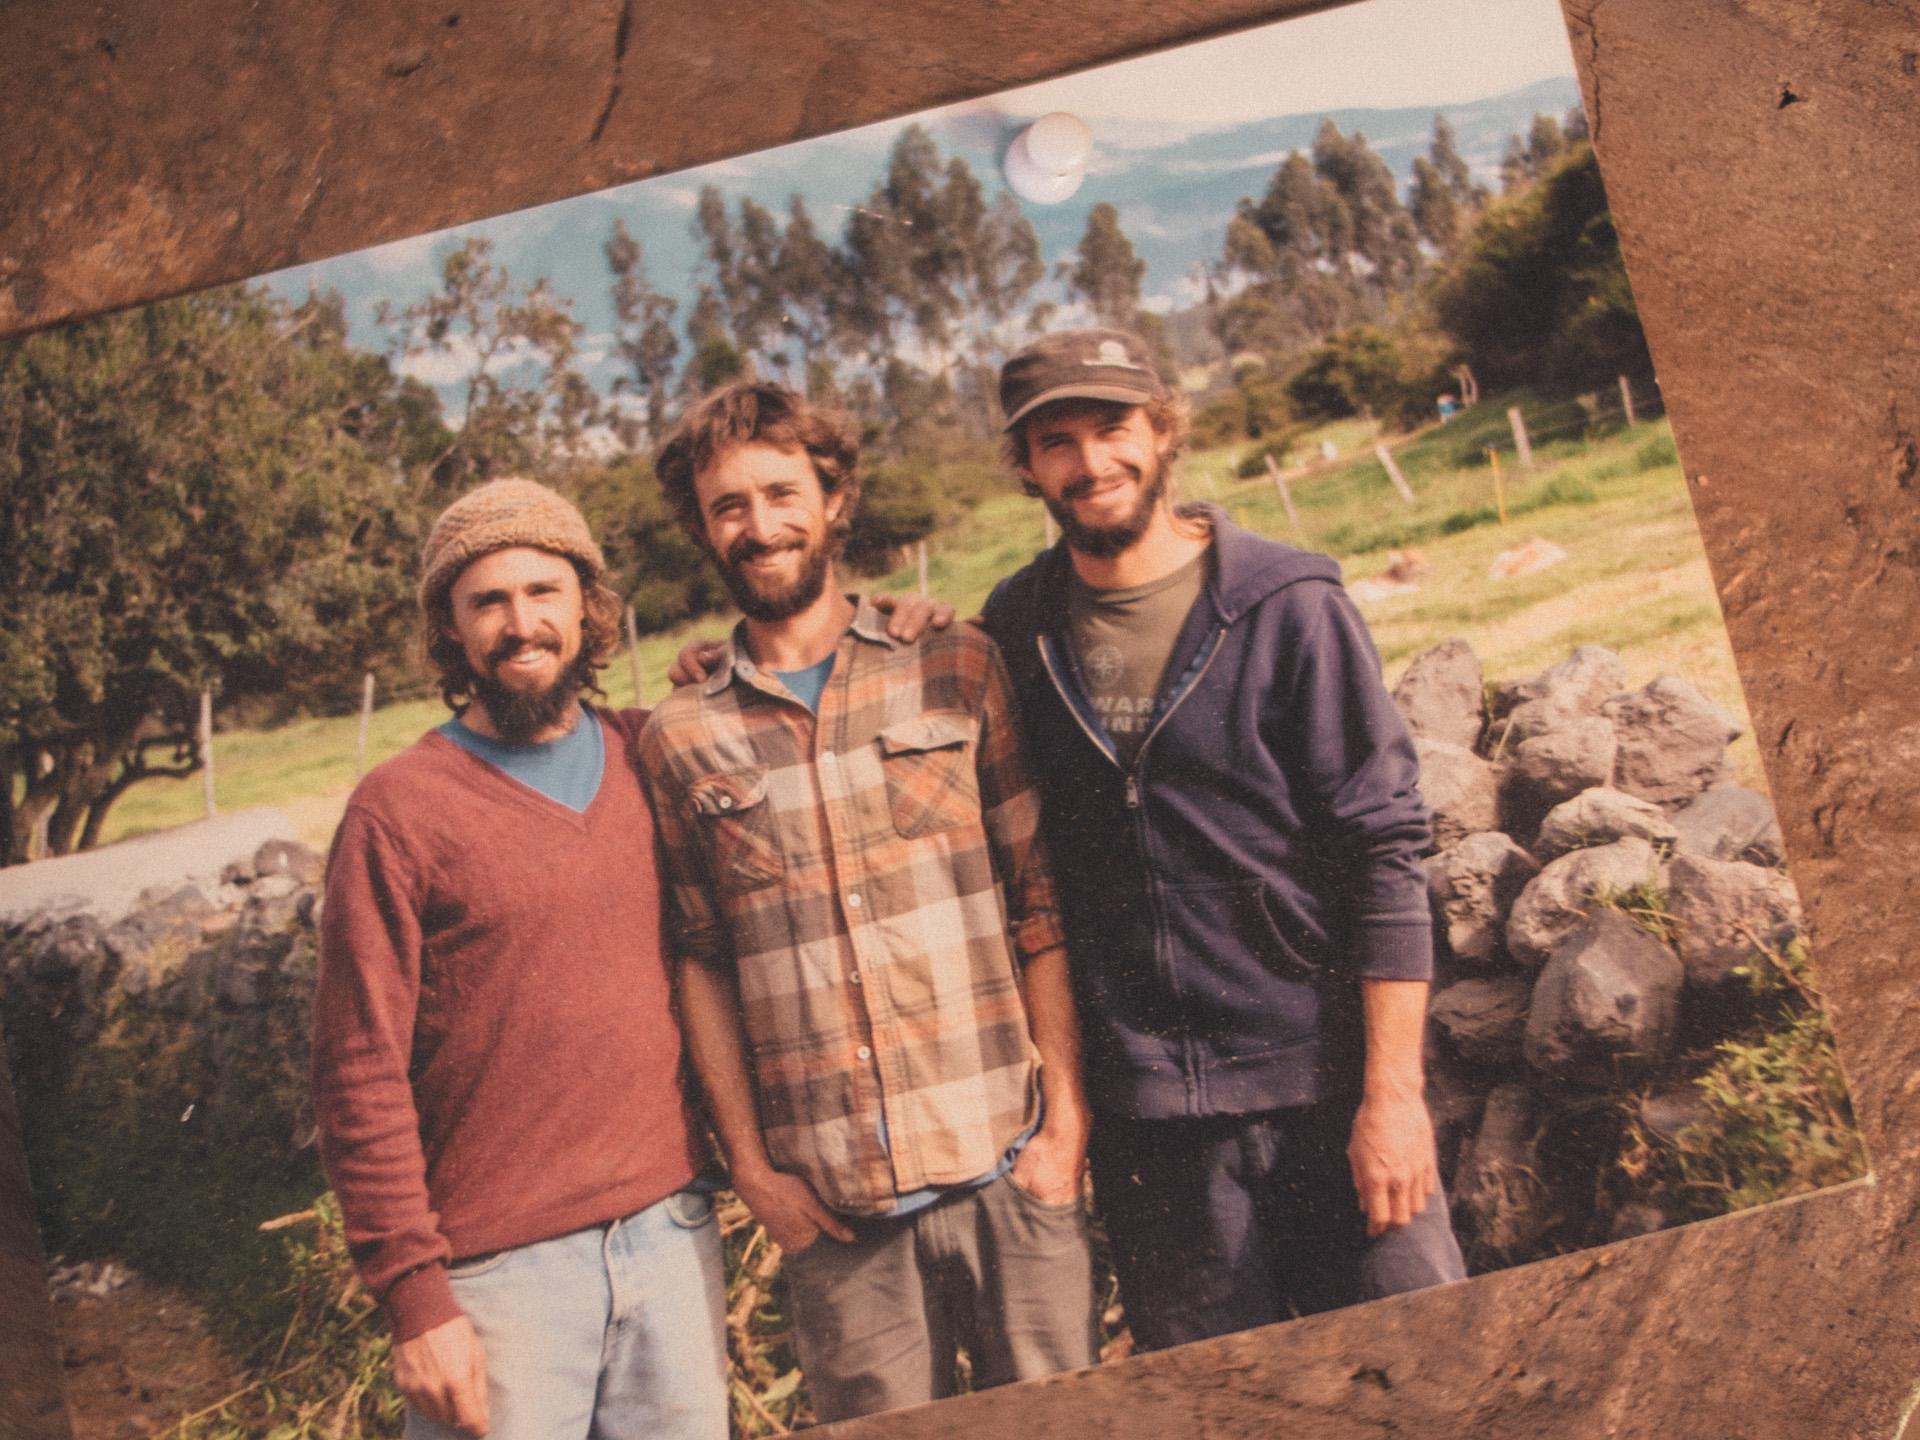 Mathias, Michael and Thomas Dammer